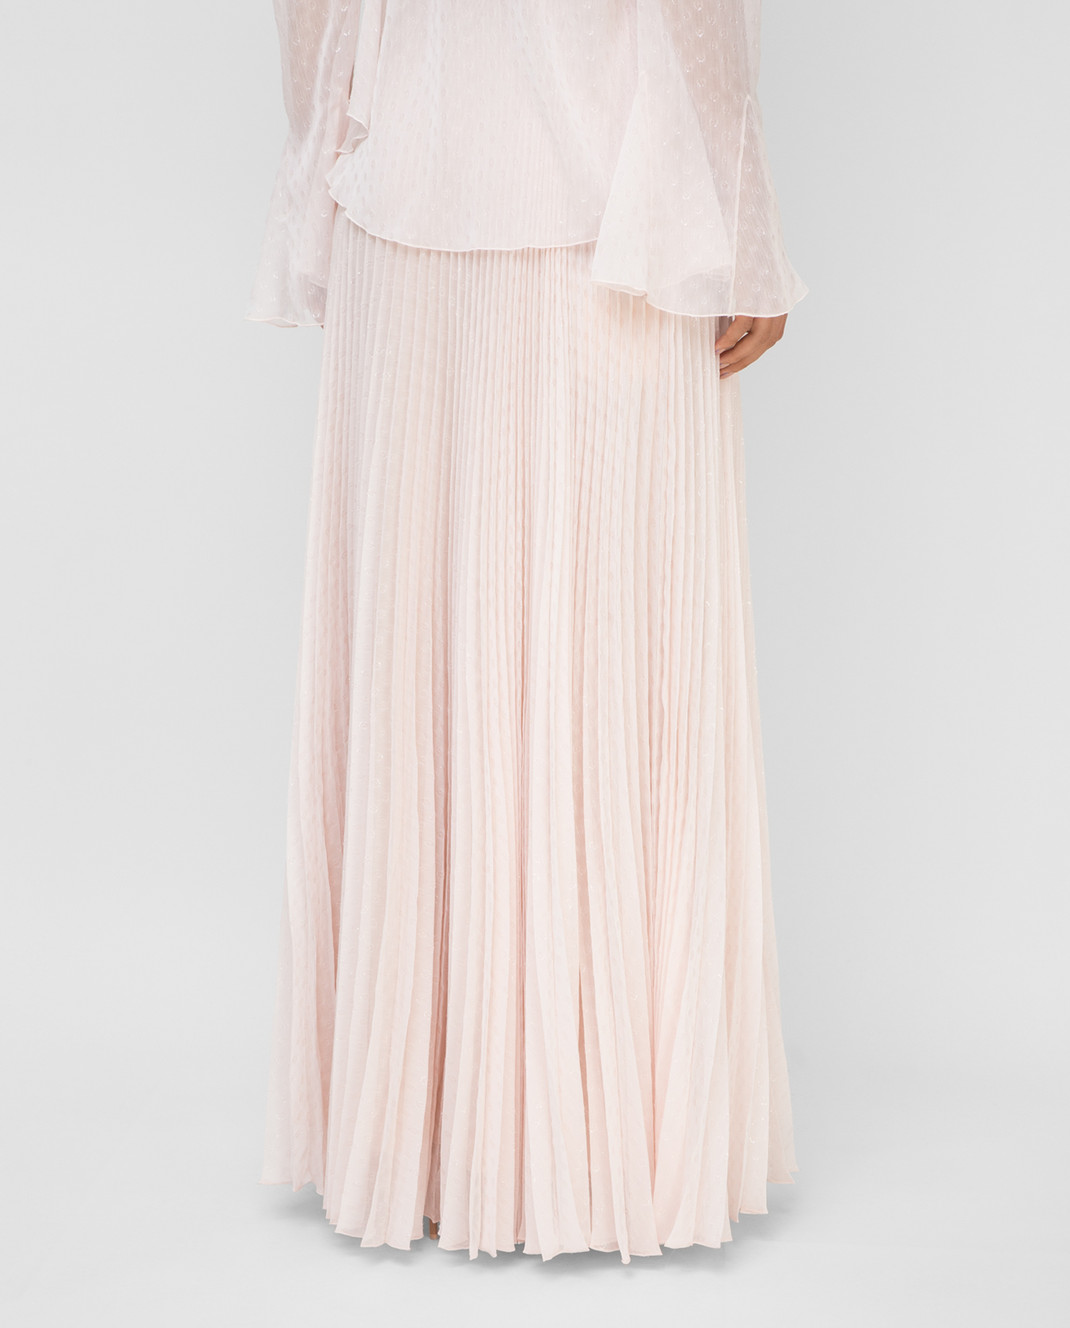 Philosophy di Lorenzo Serafini Светло-розовая юбка изображение 4